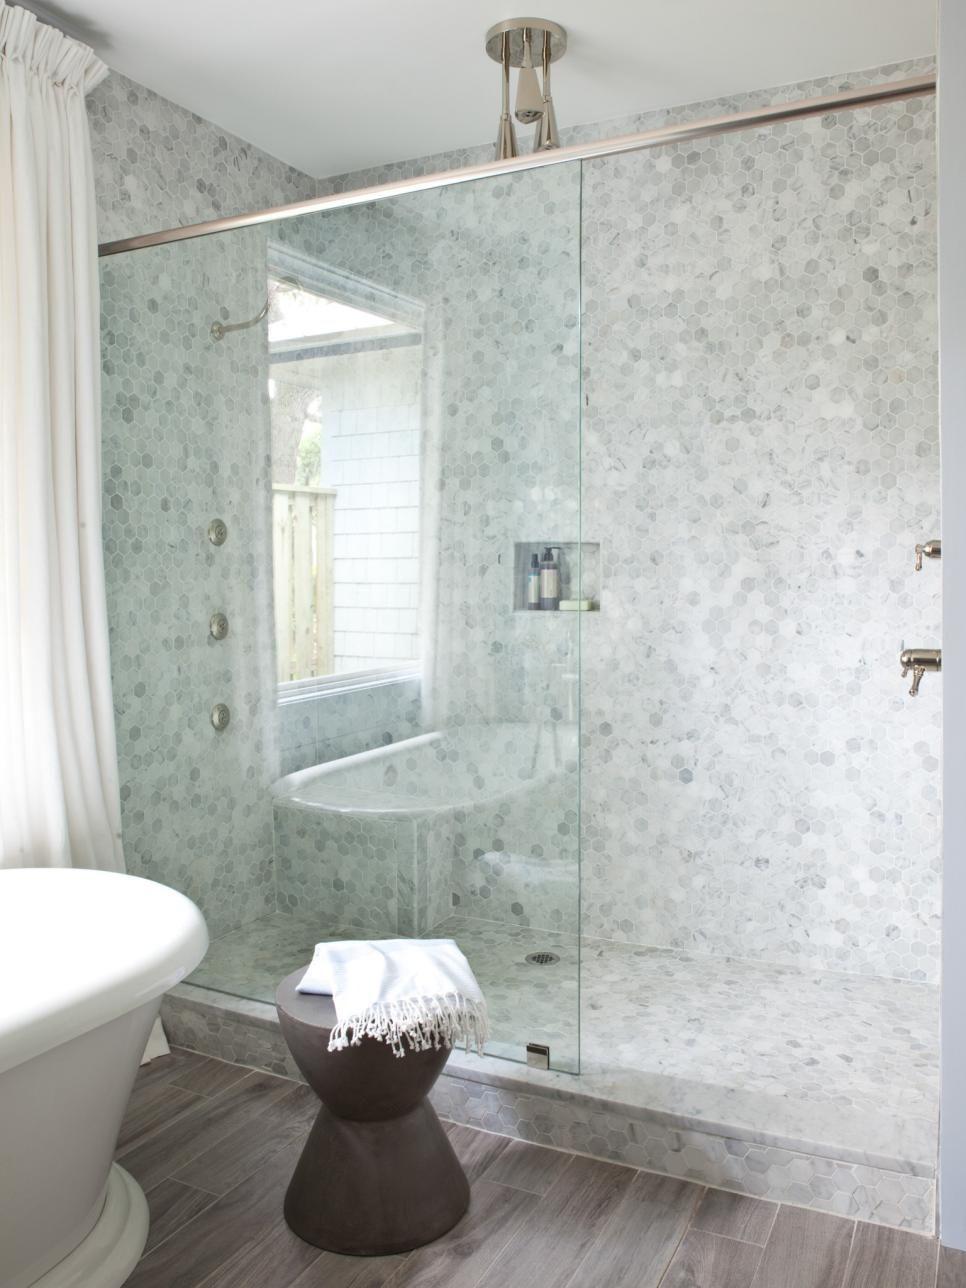 Dream Home 2017: Master Bathroom Pictures | Pinterest | Master ...